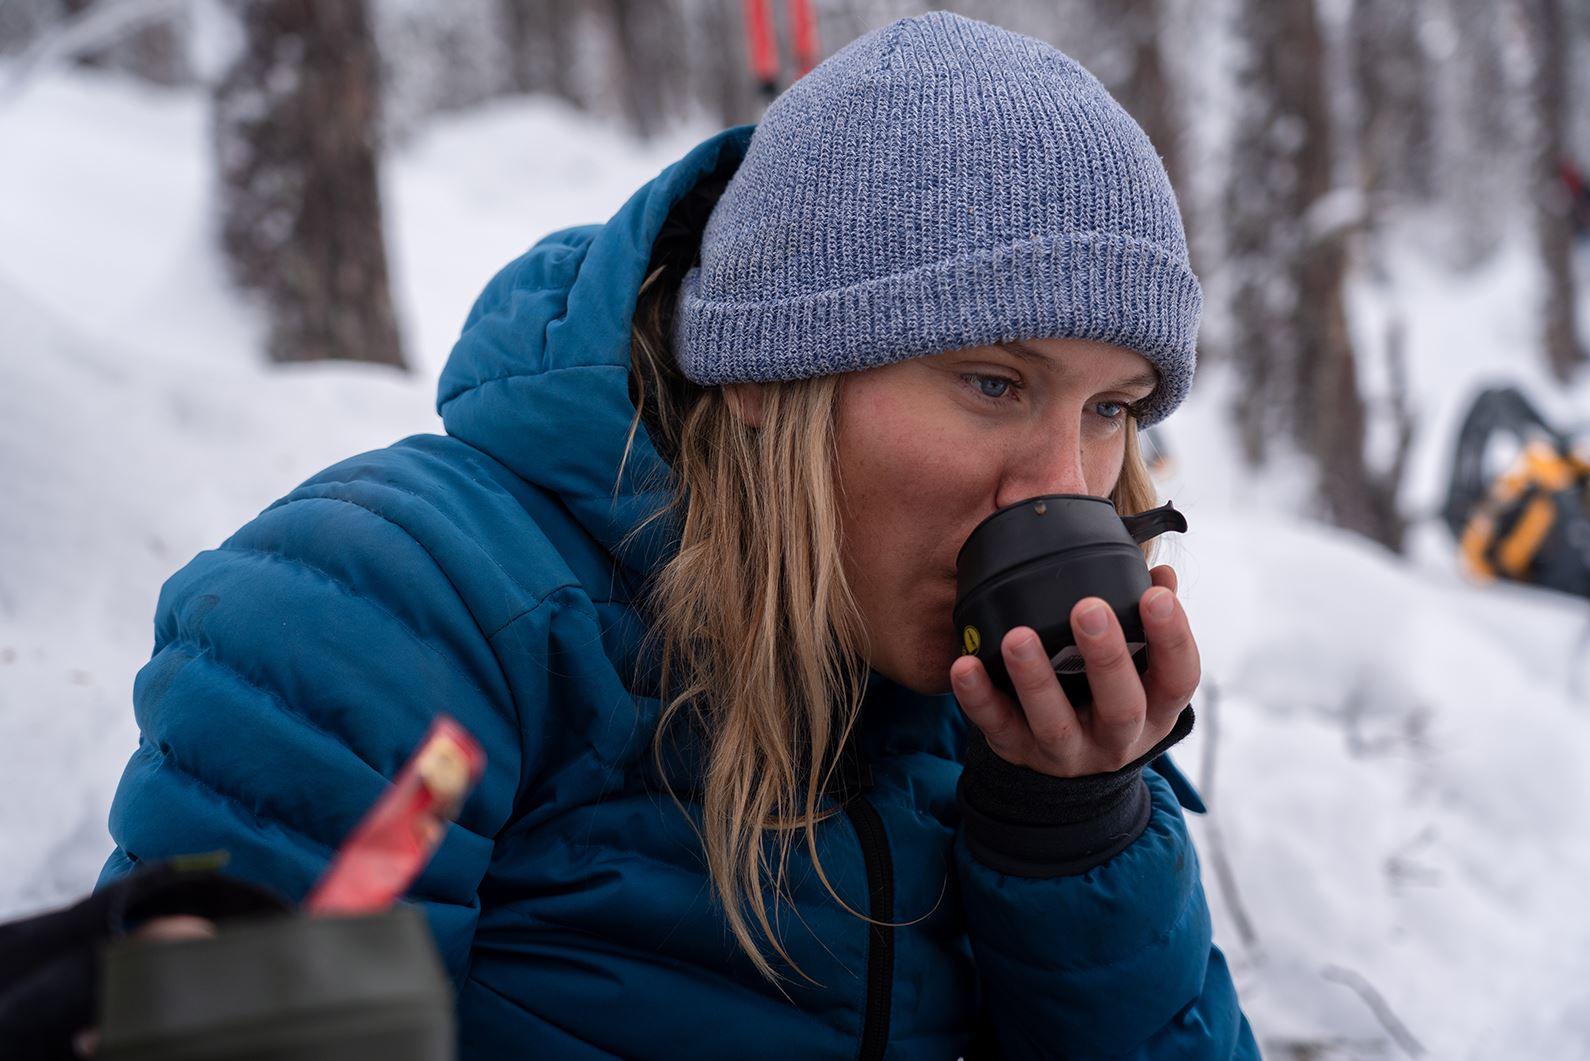 © Hunnalvatn Media, Snowshoeing in Raundalen